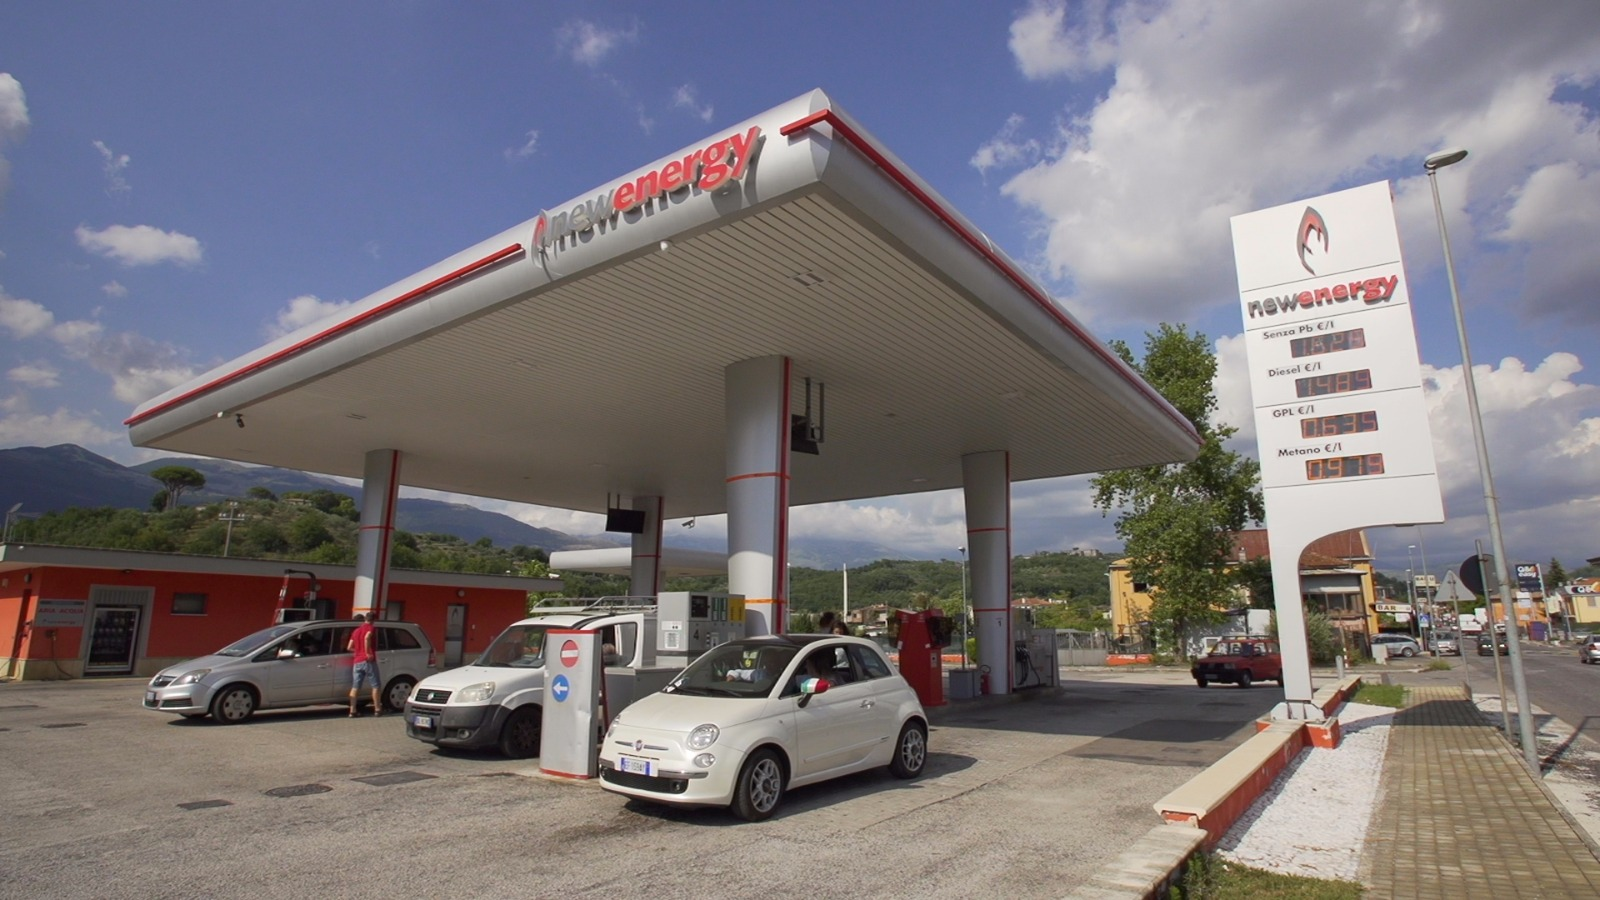 http://www.newenergycarburanti.it/wp-content/uploads/2018/07/WhatsApp-Image-2018-07-18-at-15.13.30-1.jpeg